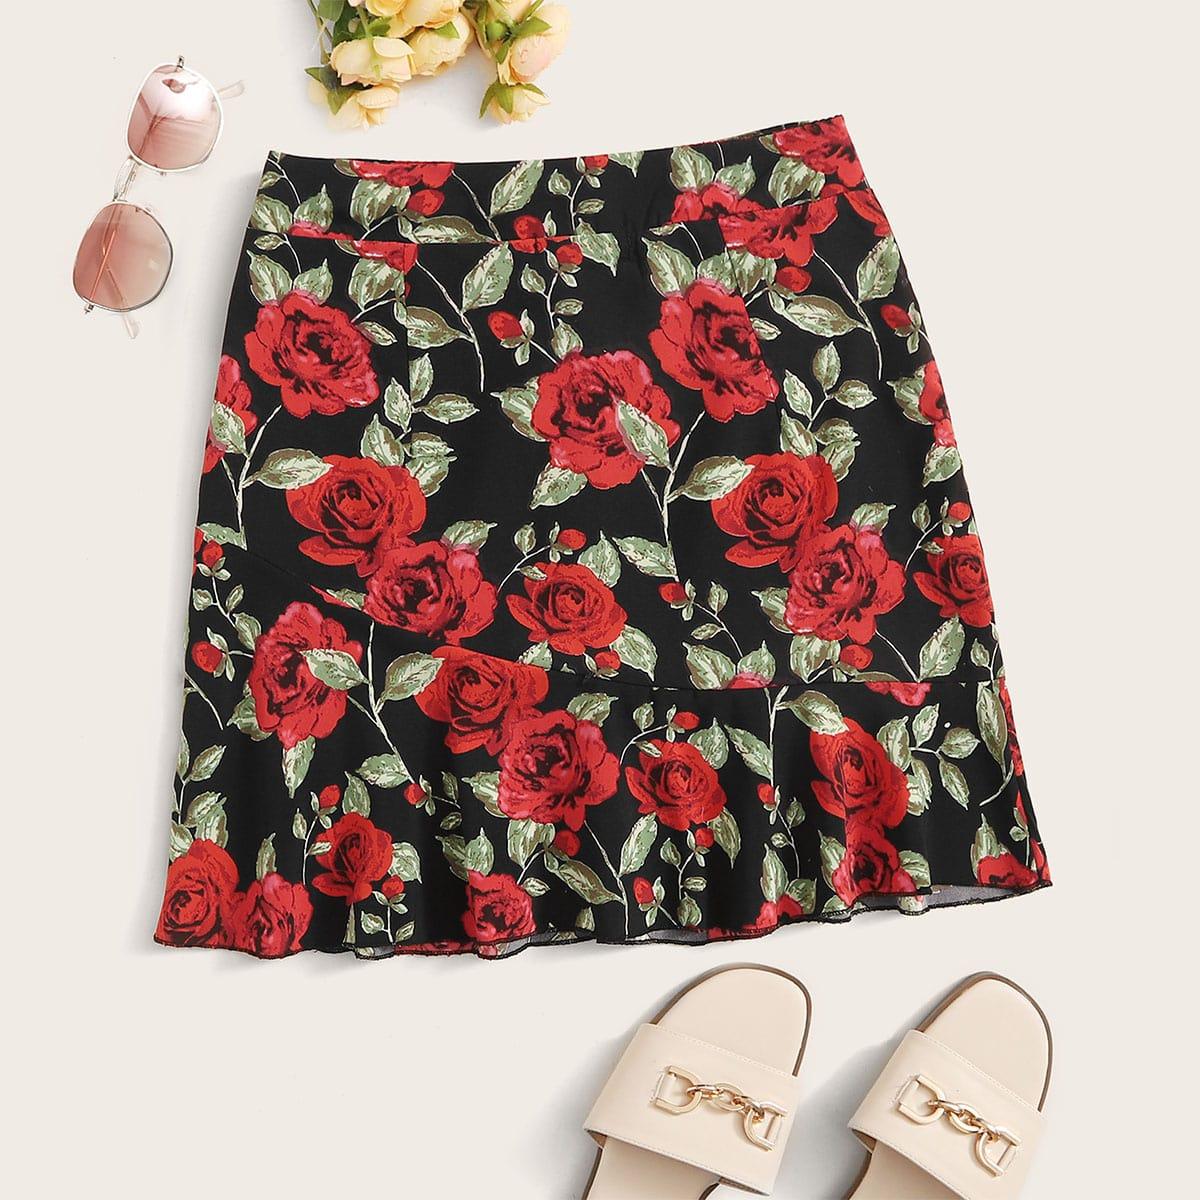 Цветочная юбка размера плюс фото